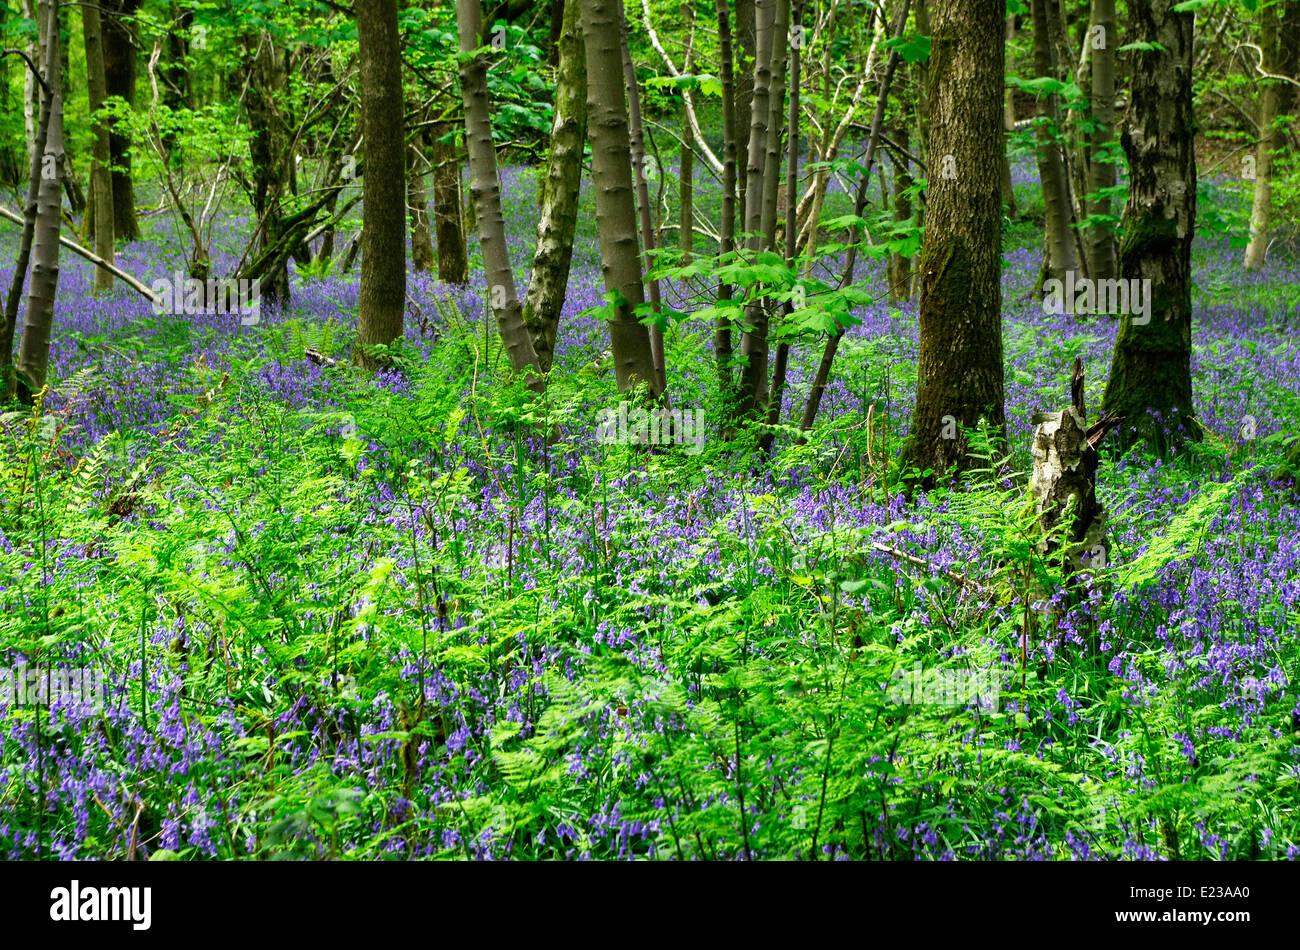 Bluebells ( Endymion non-scriptus ) in Flower at Eggerslack Wood, Nr Grange-Over-Sands, Cumbria, England, UK - Stock Image